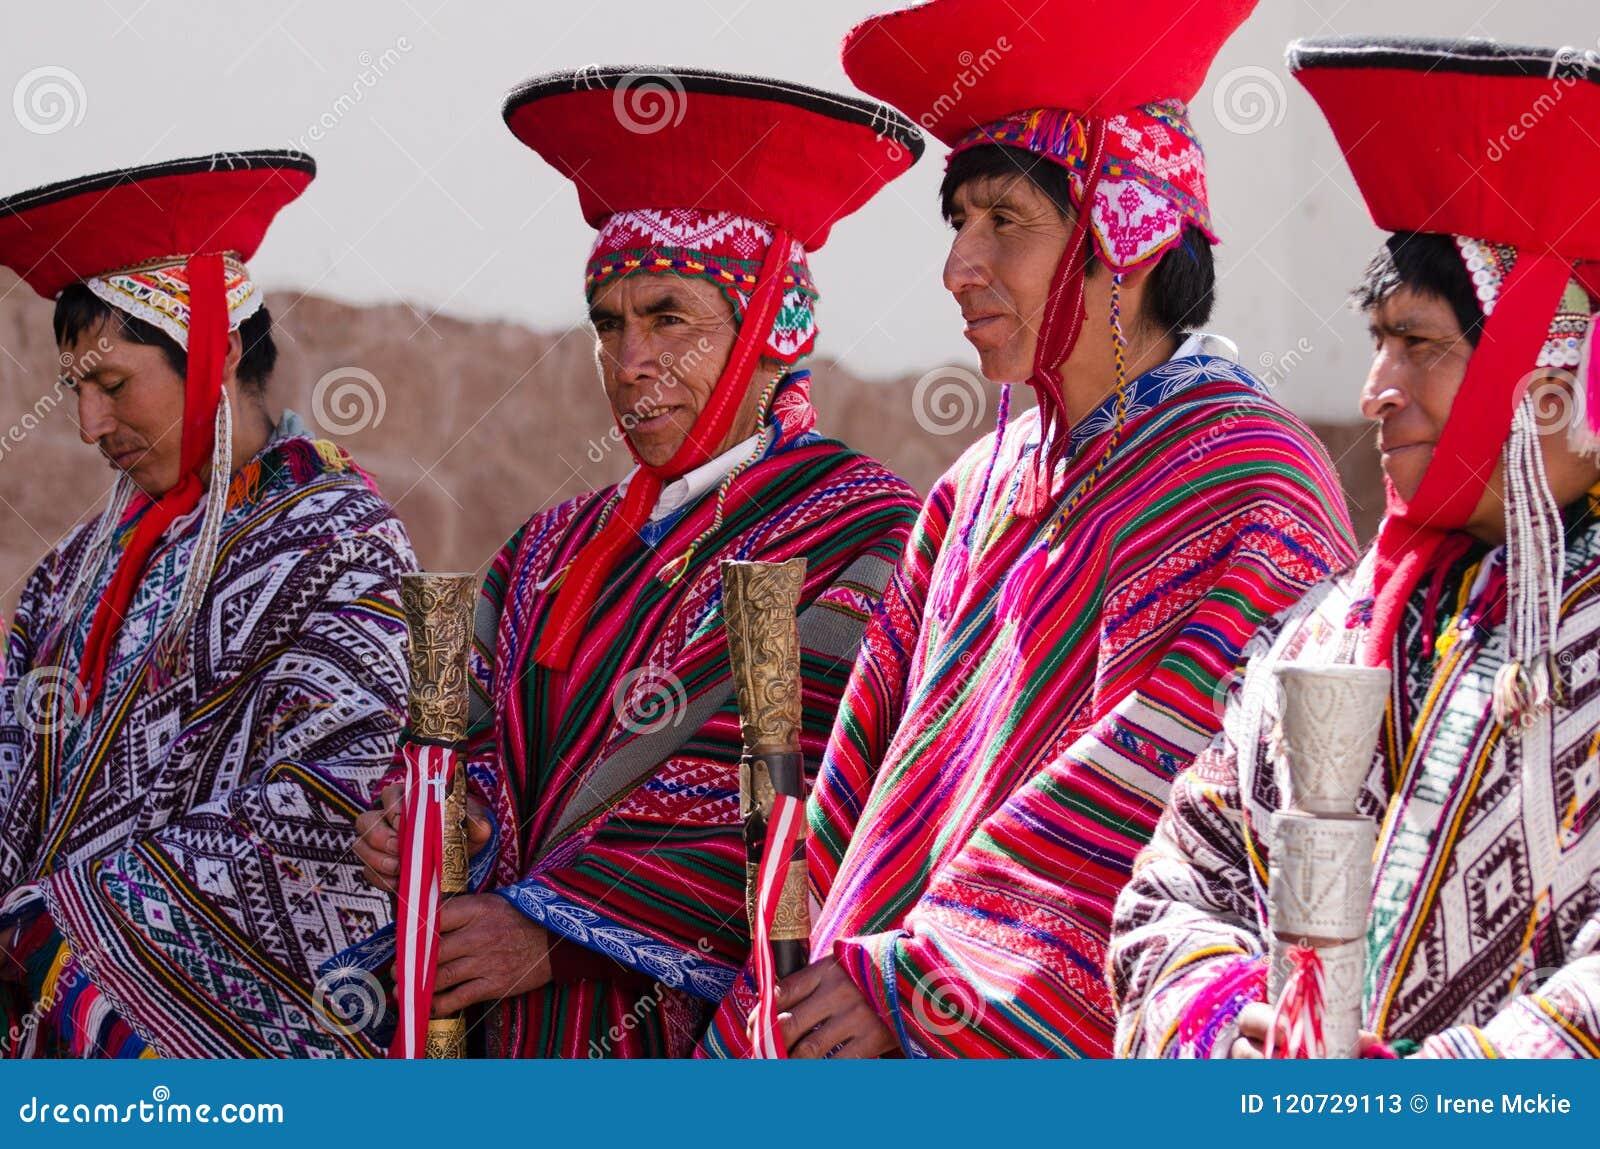 Peru religious men, elders standing in line waiting for church service